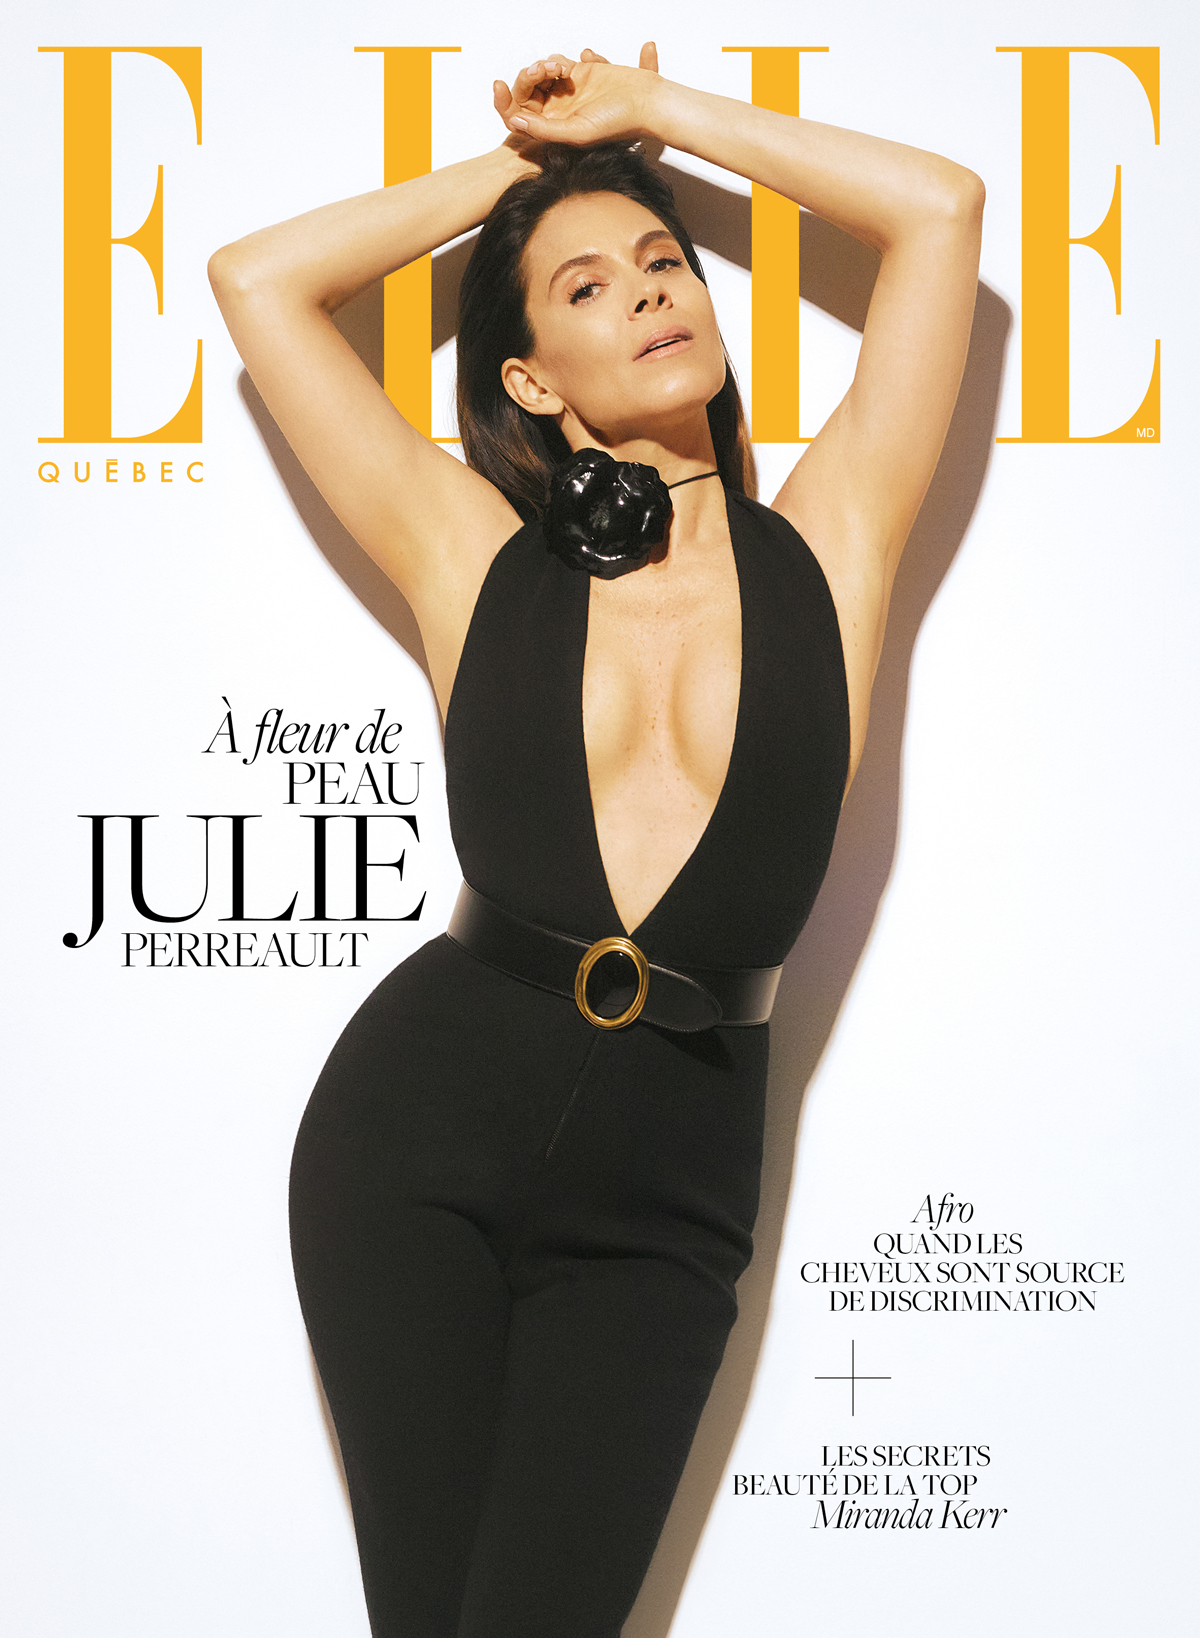 Julie Perreault x ELLE Québec